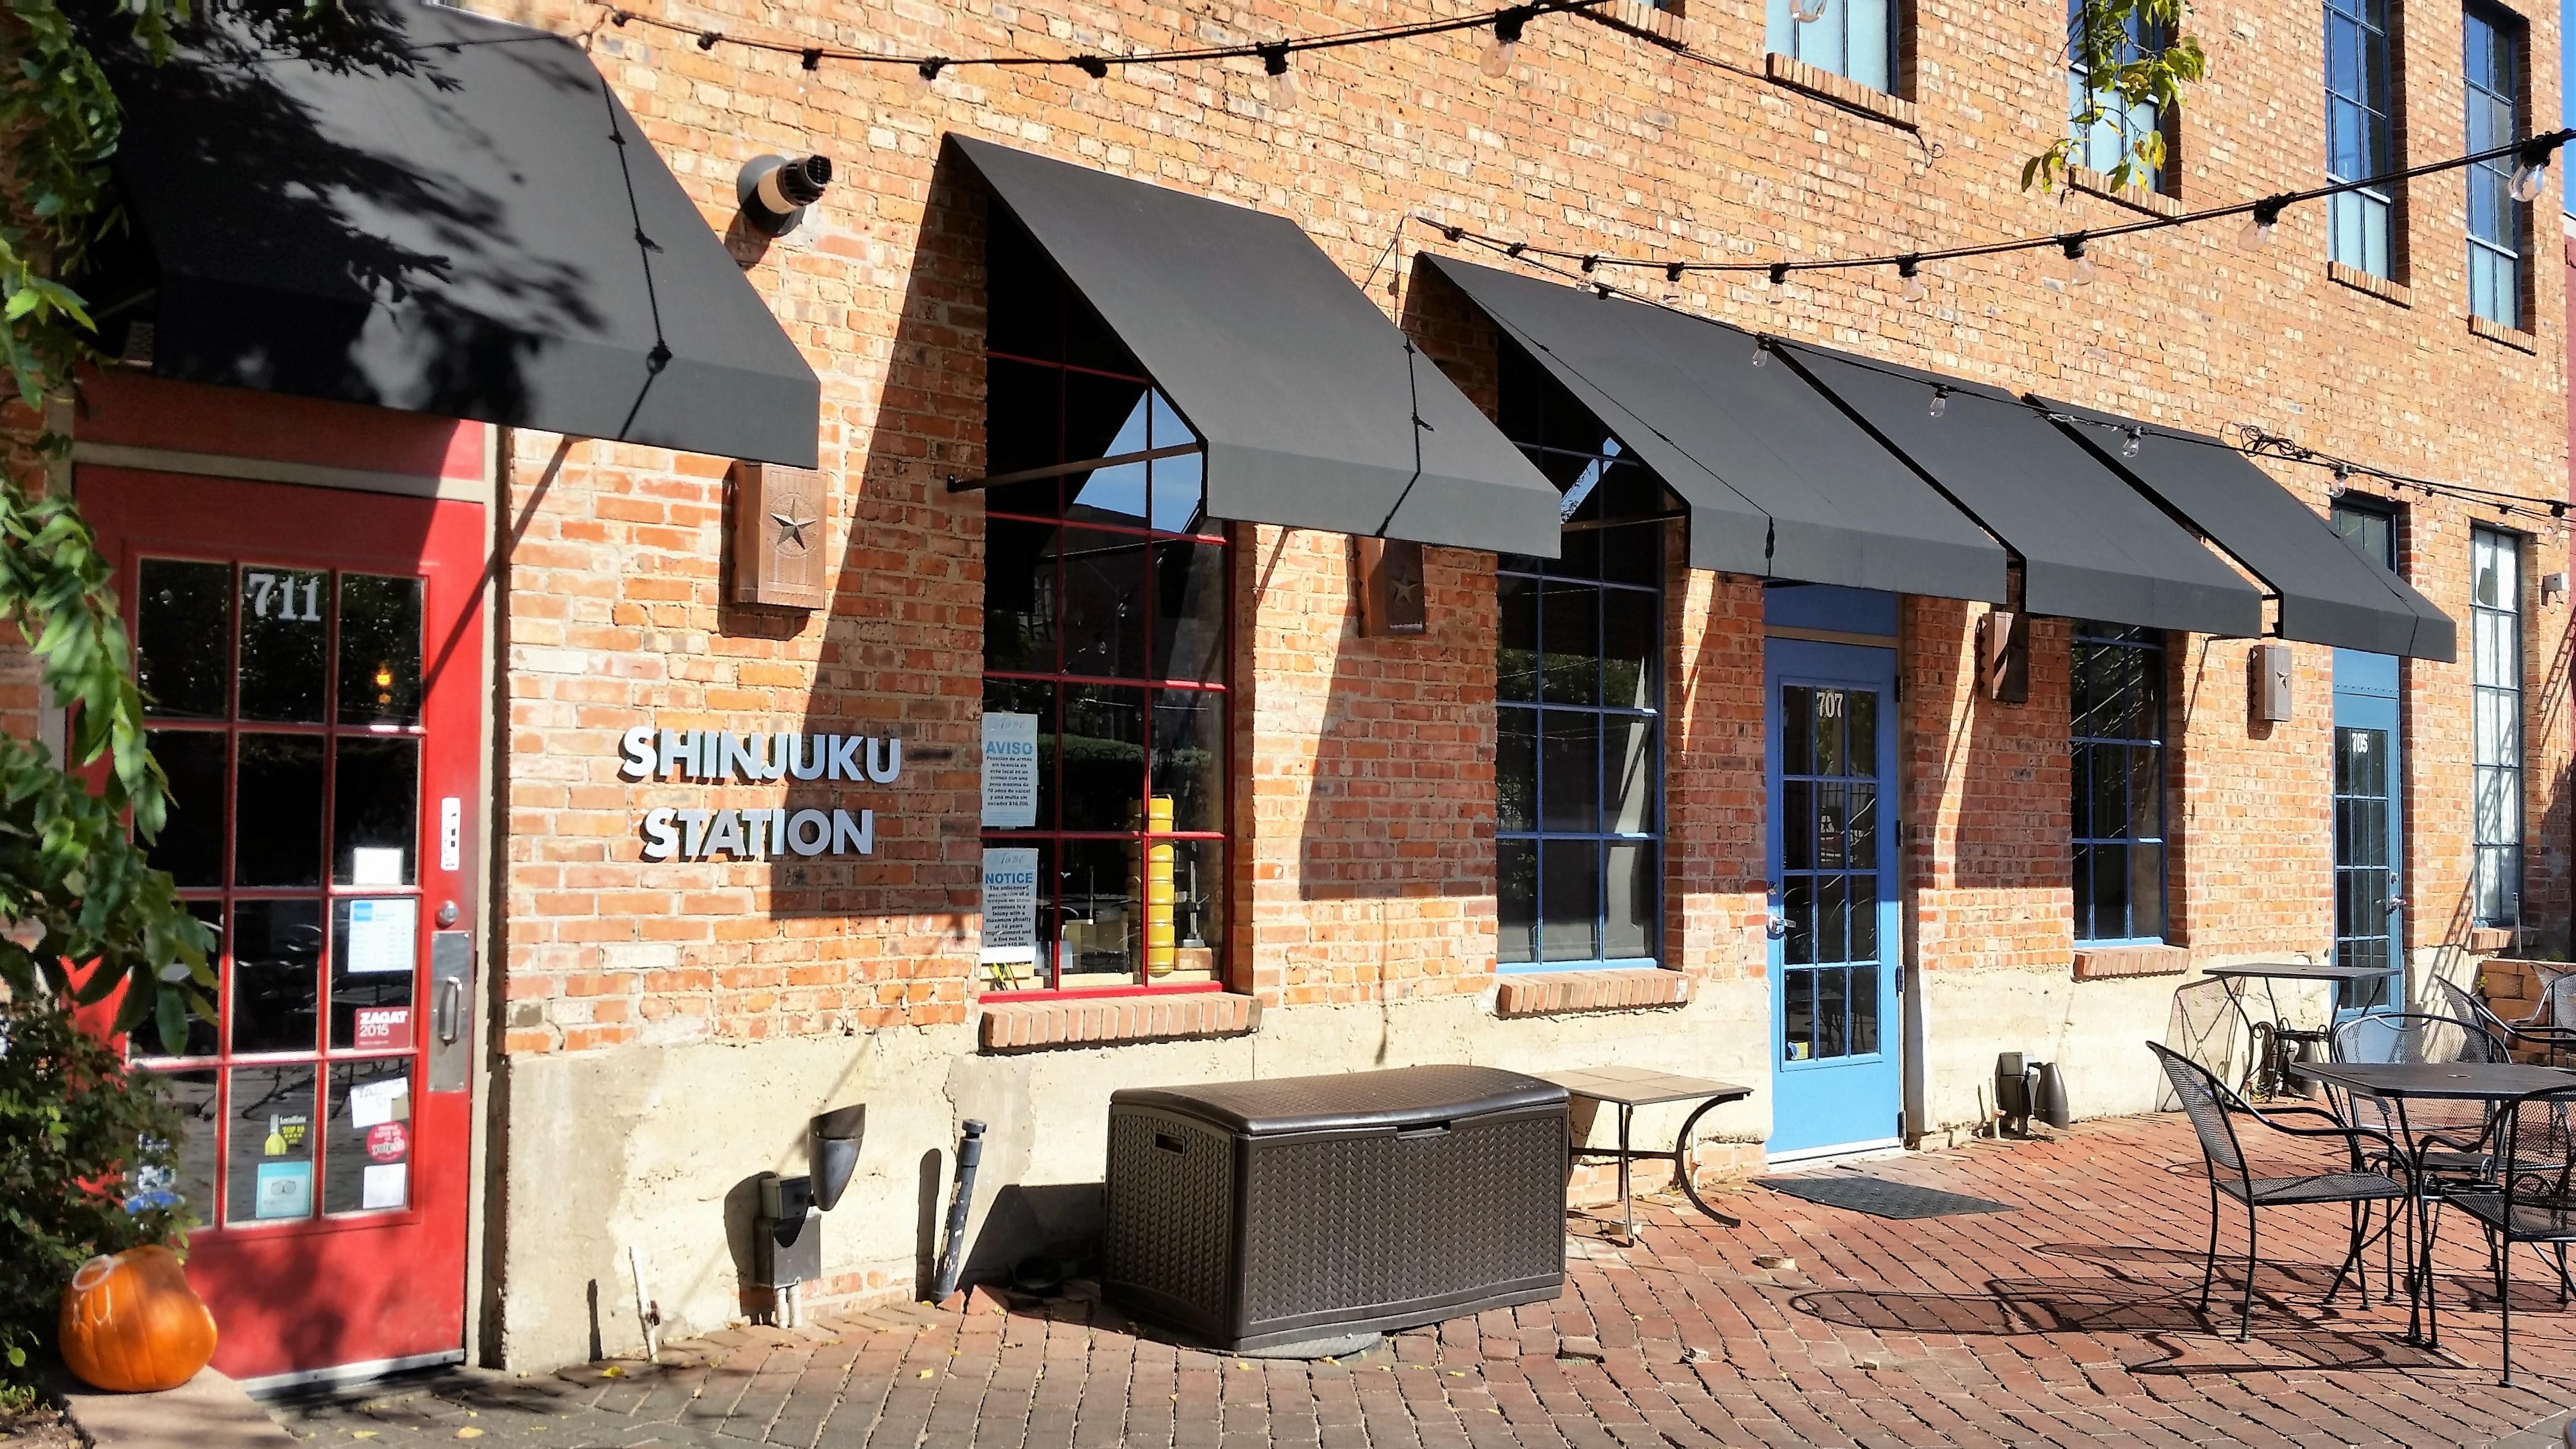 JOB# 1629 SHINJUKU STATION FT WORTH, TX.